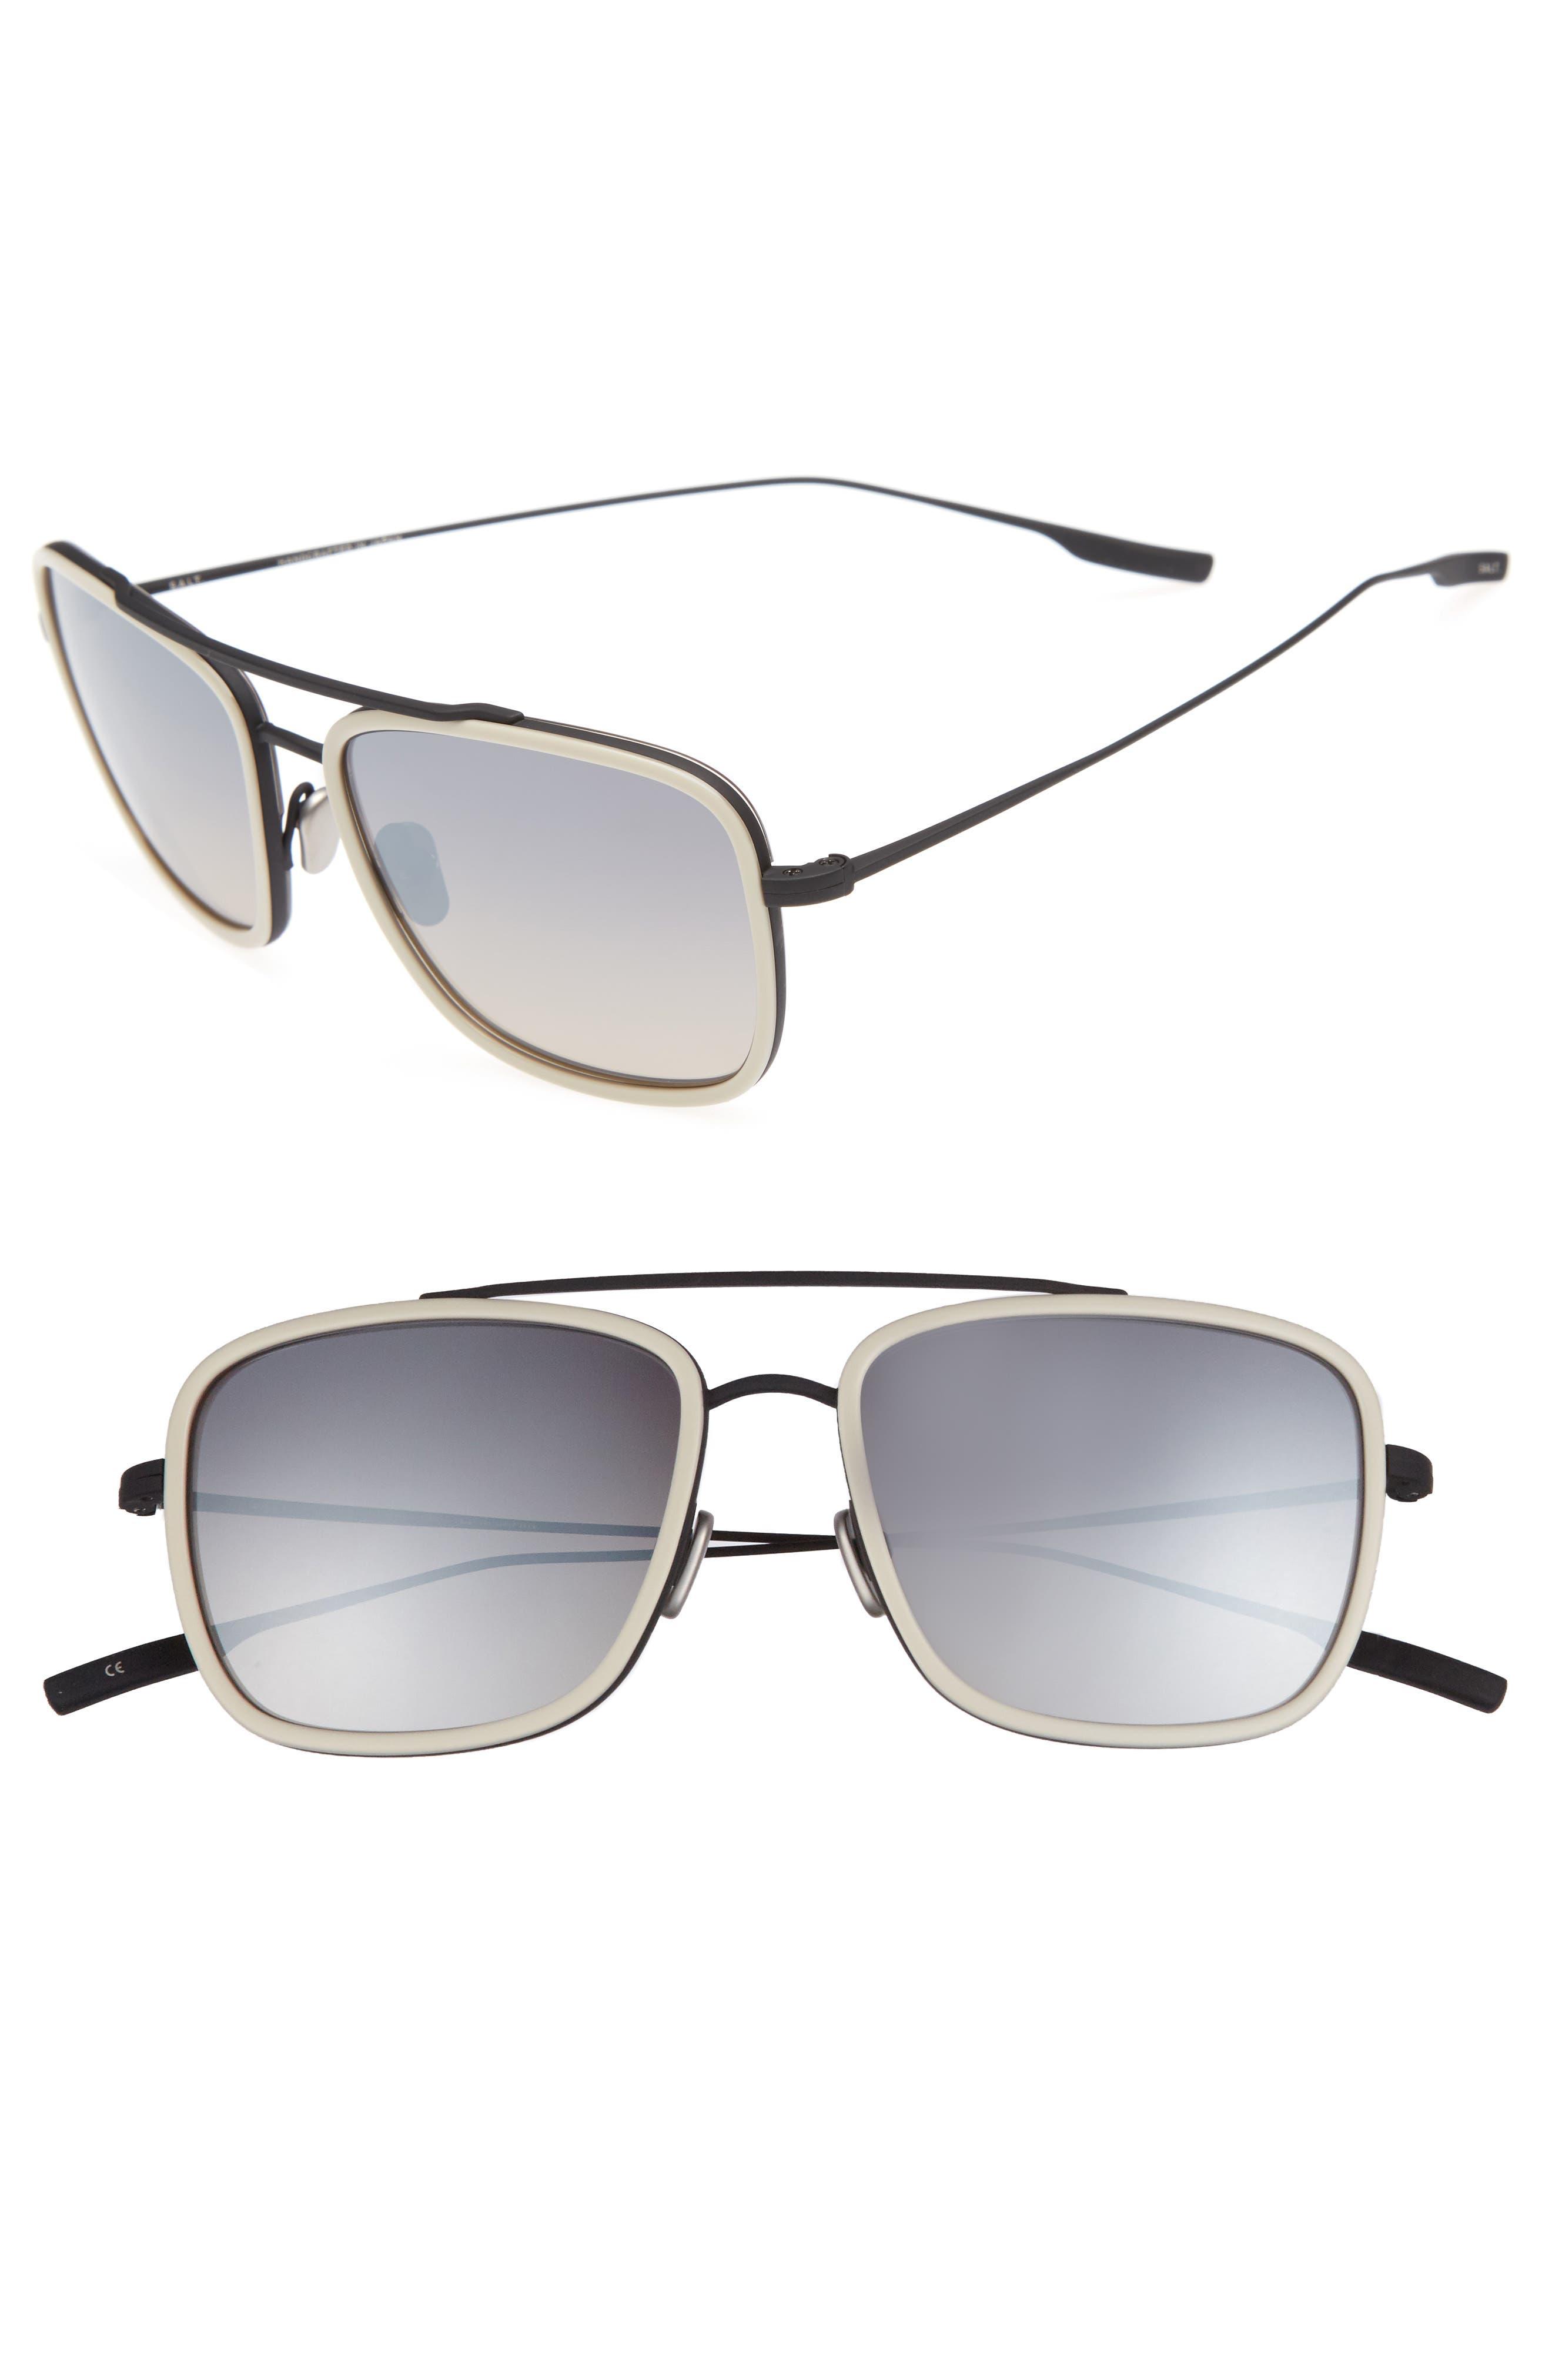 Harrison 54mm Polarized Sunglasses,                         Main,                         color, Black Sand/ Oyster Grey